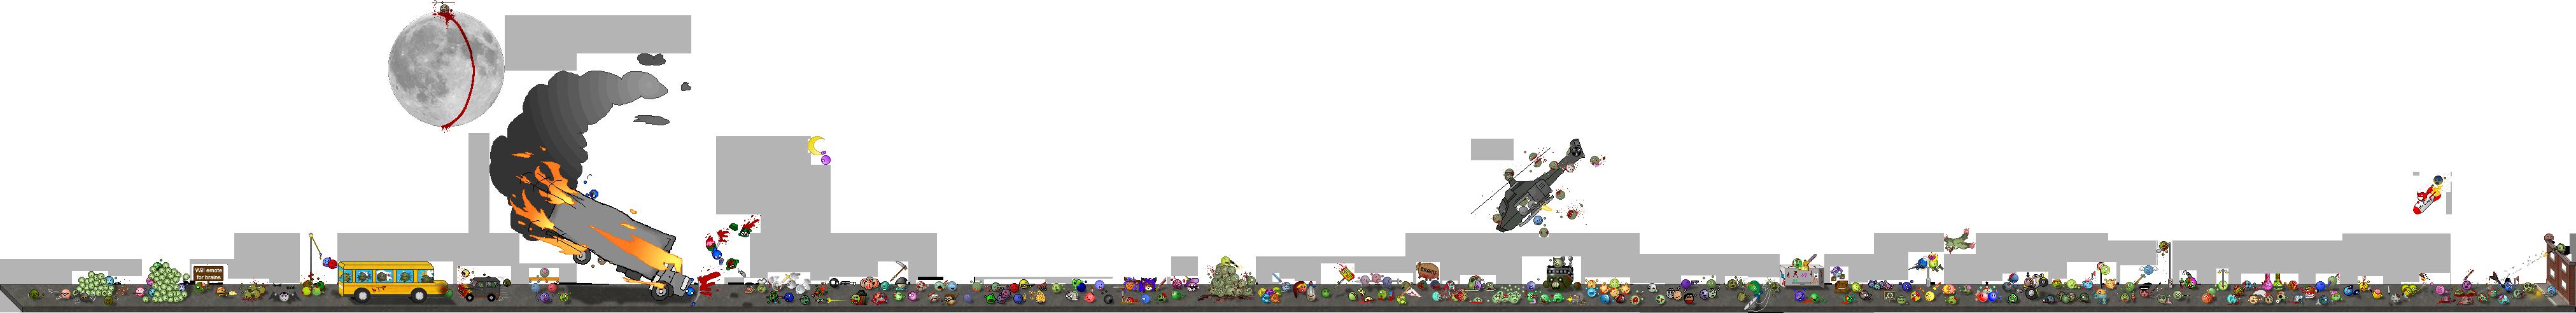 Emote Project: Zombie Nation by LeoLeonardo